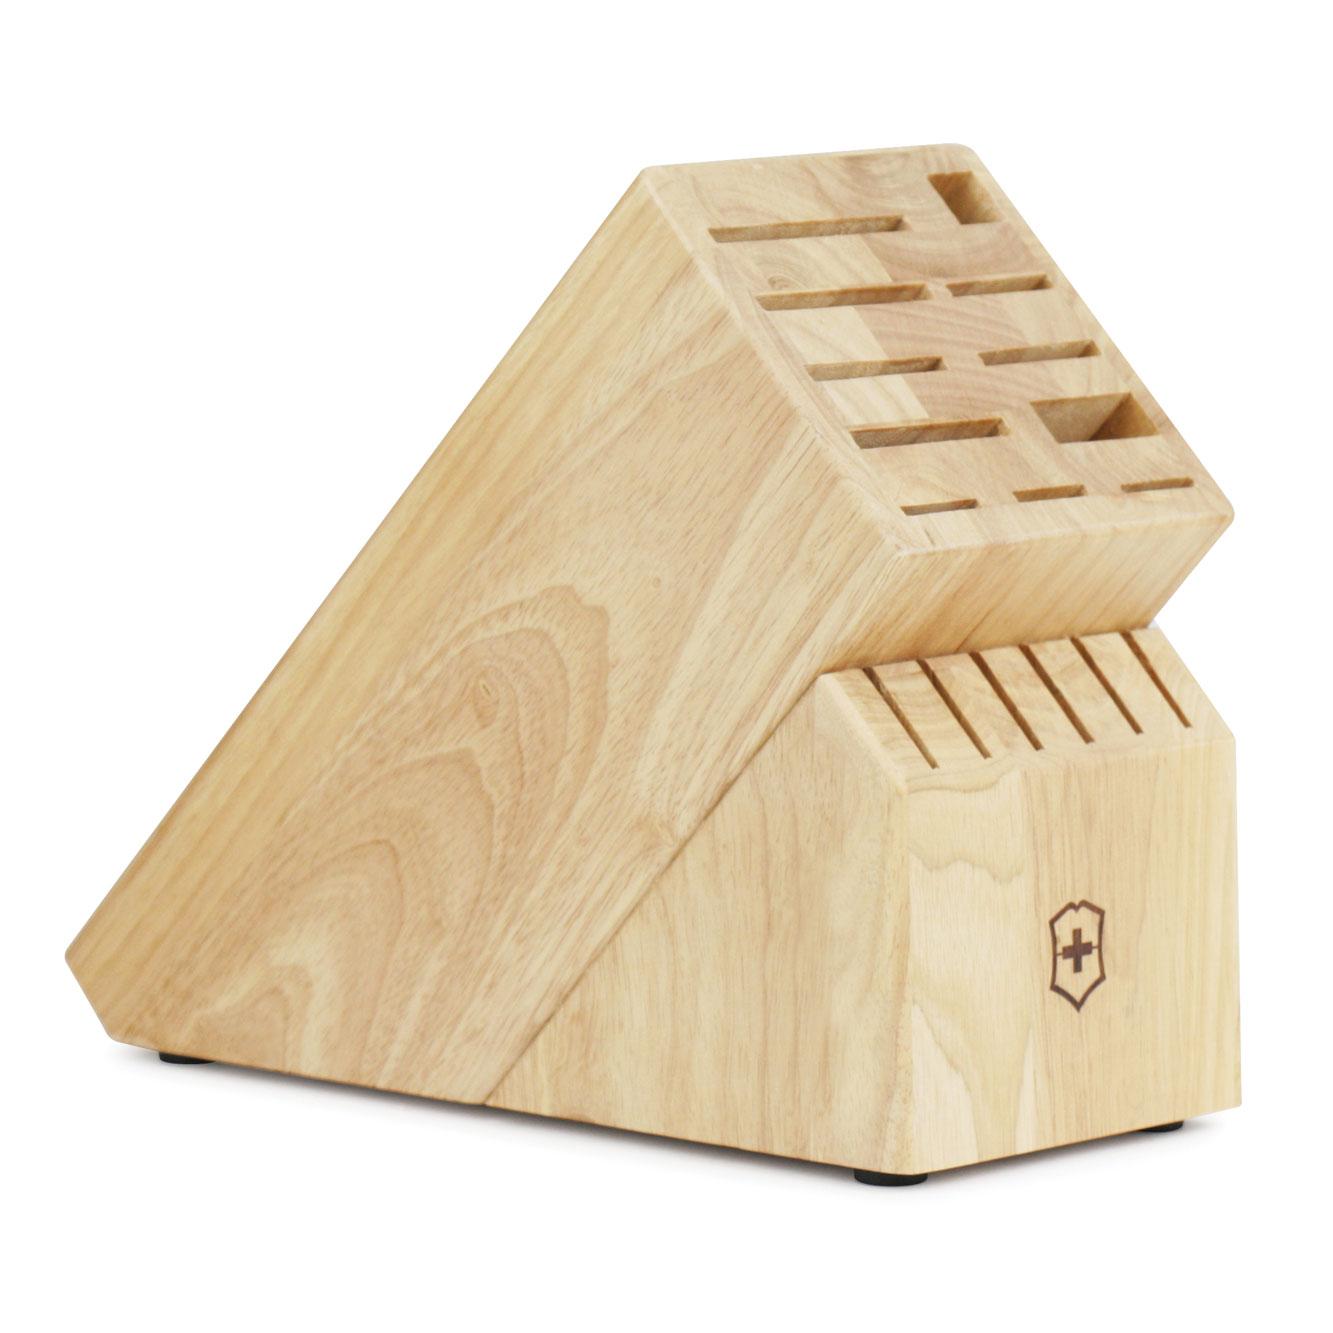 Victorinox Swiss Classic Knife Block Set 15 Piece